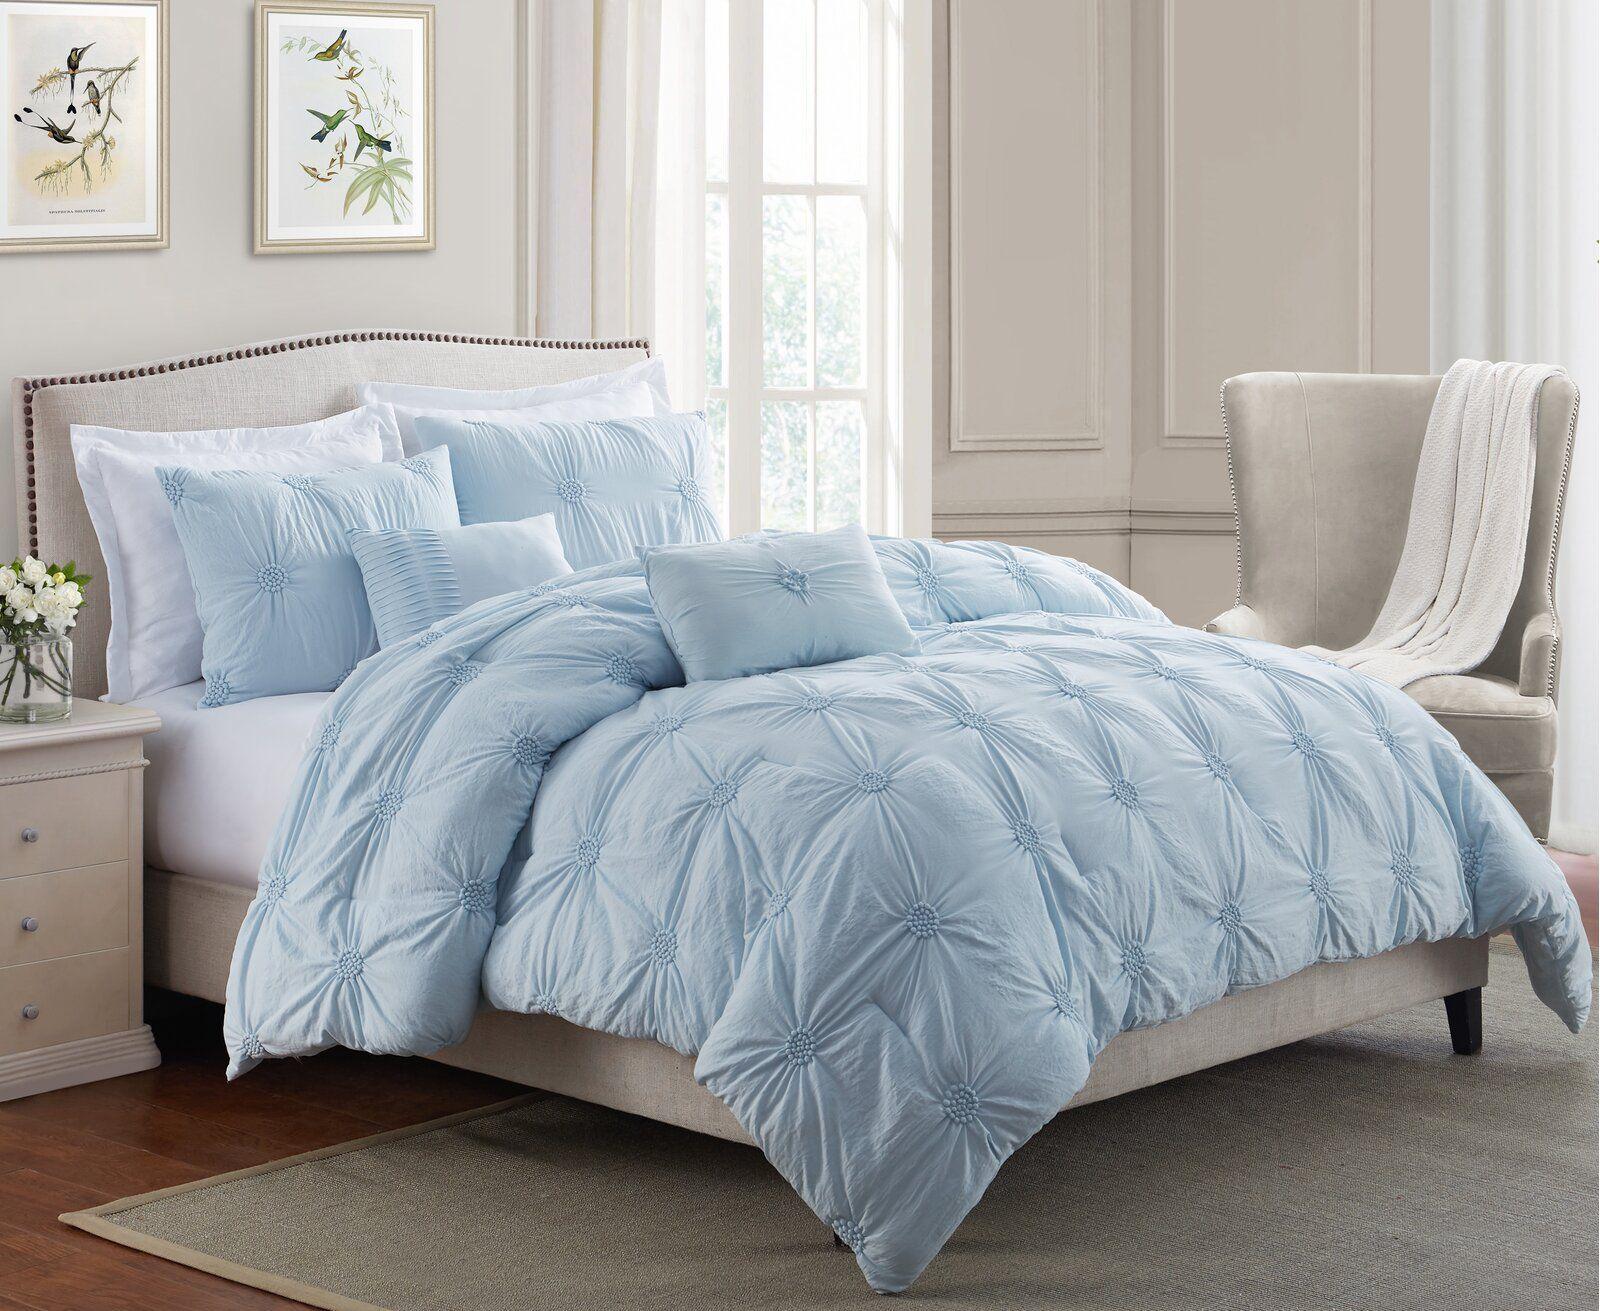 Beckman Luxurious Comforter Set In 2020 Baby Blue Bedrooms Light Blue Bedroom Comforter Sets